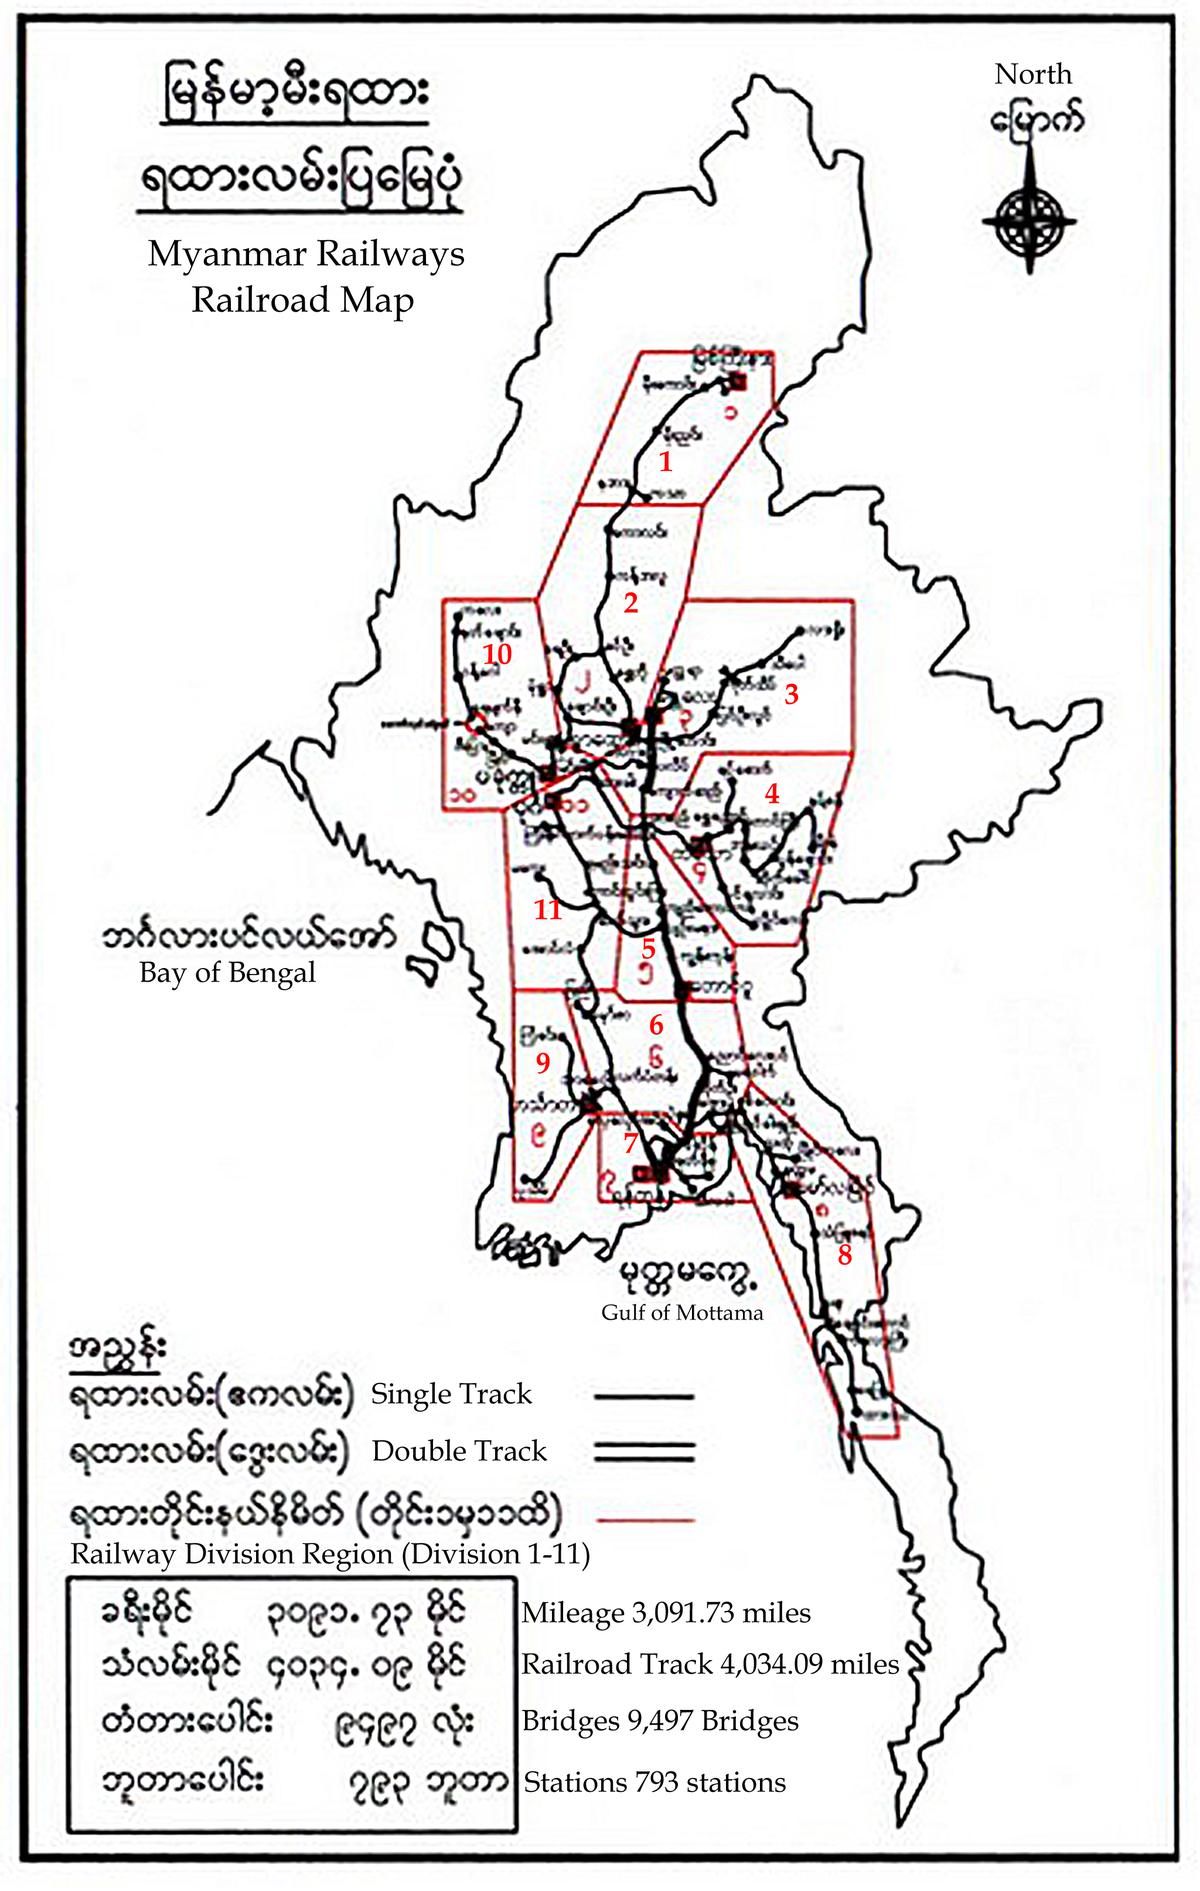 1200x1891 List Of Railway Stations In Myanmar